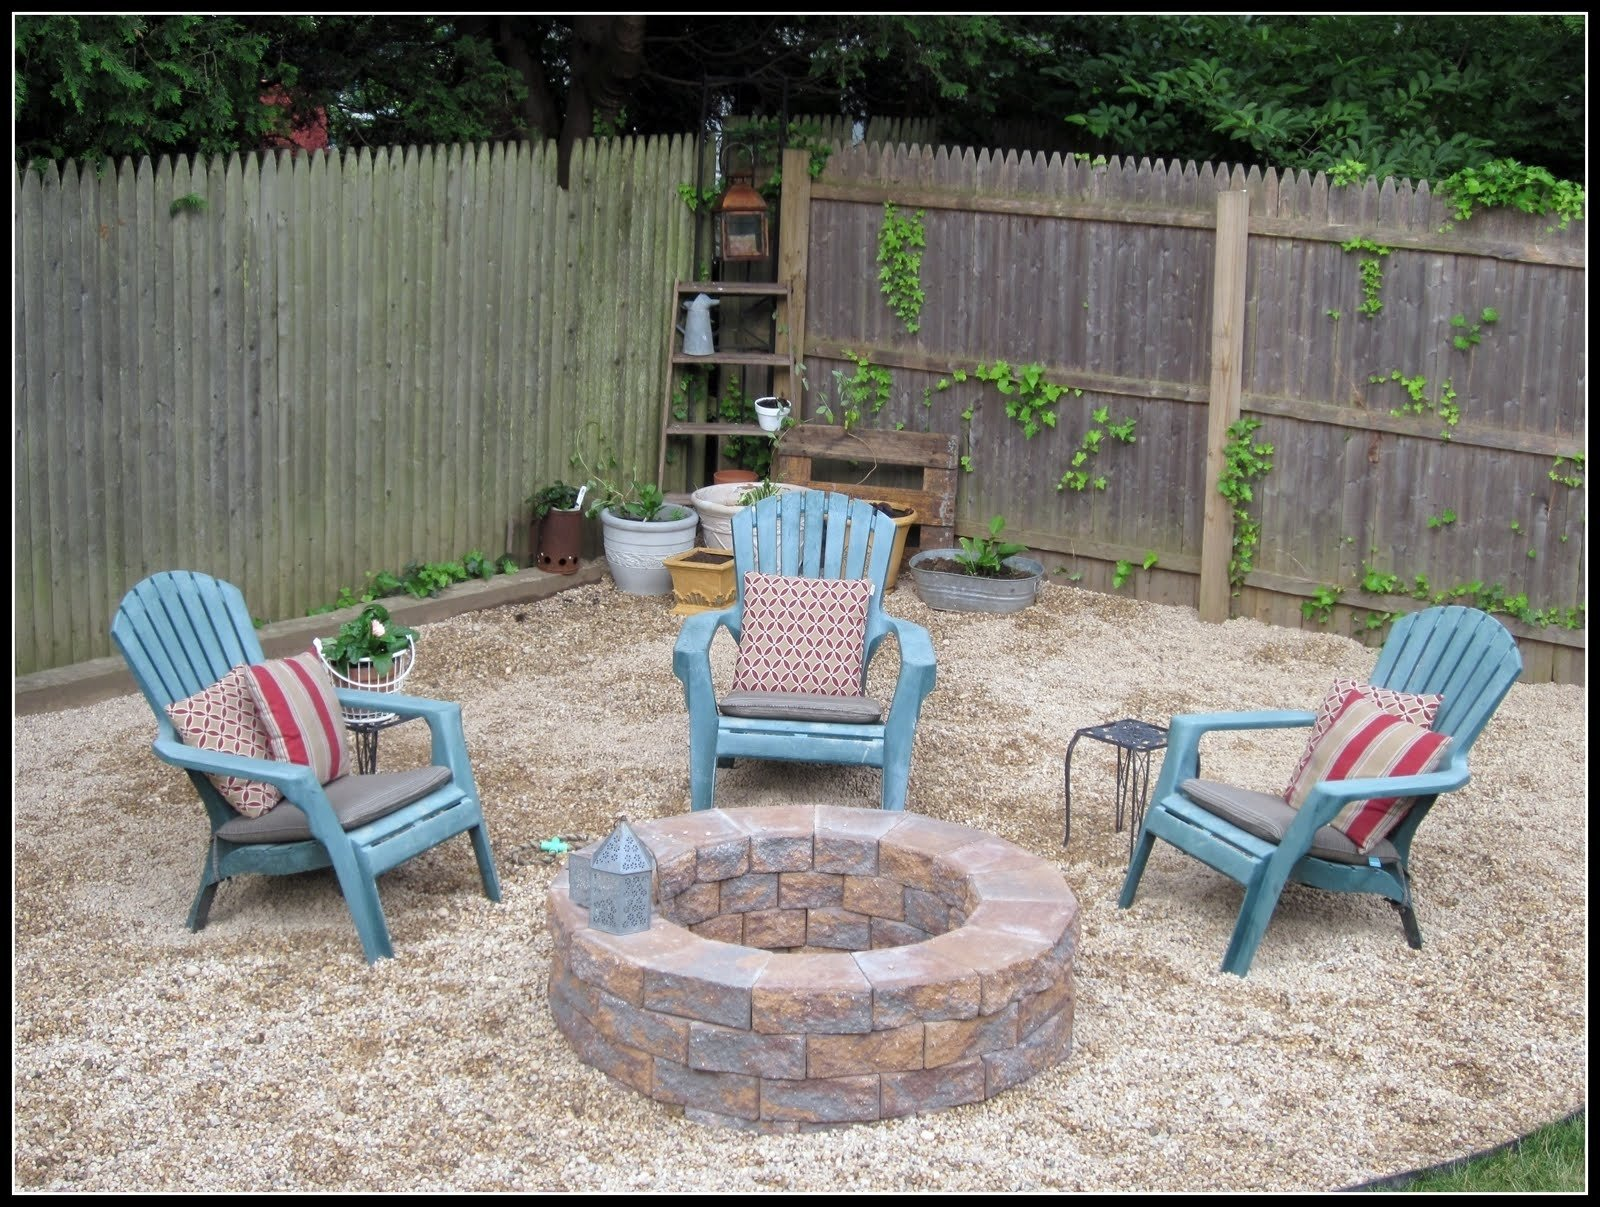 10 Beautiful Simple Backyard Fire Pit Ideas stunning backyard fire pit ideas fireplace design ideas 2021